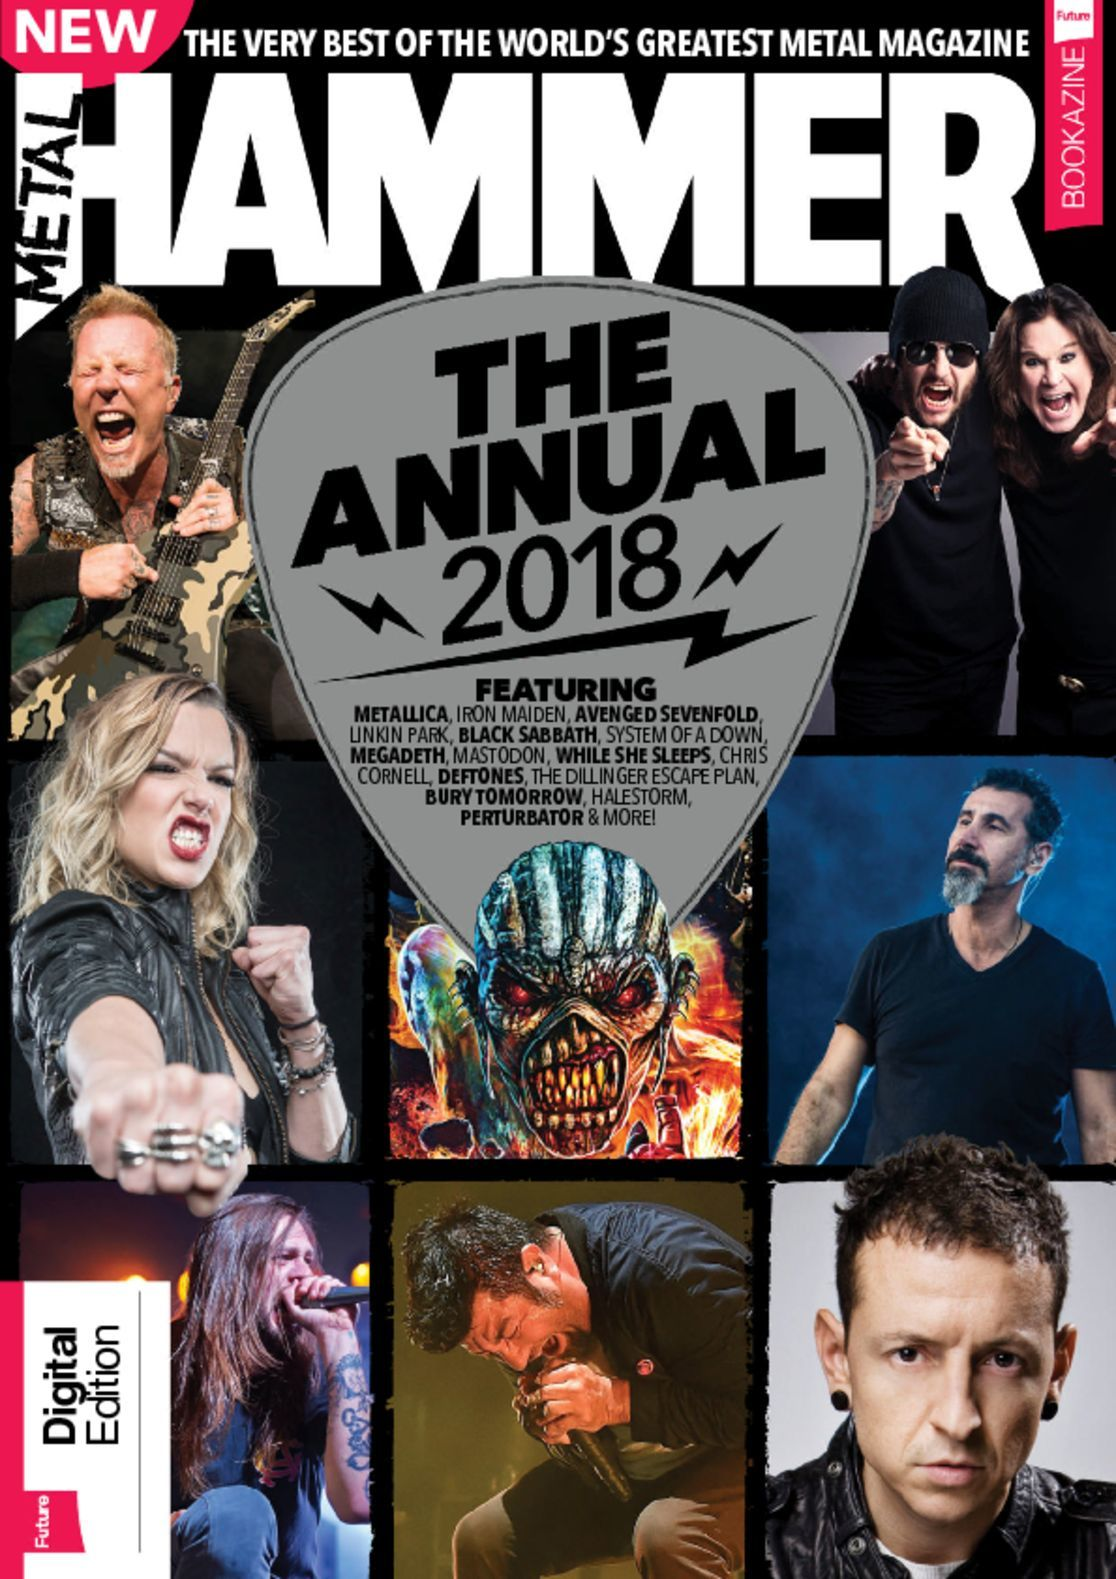 Metal Hammer Annual Digital